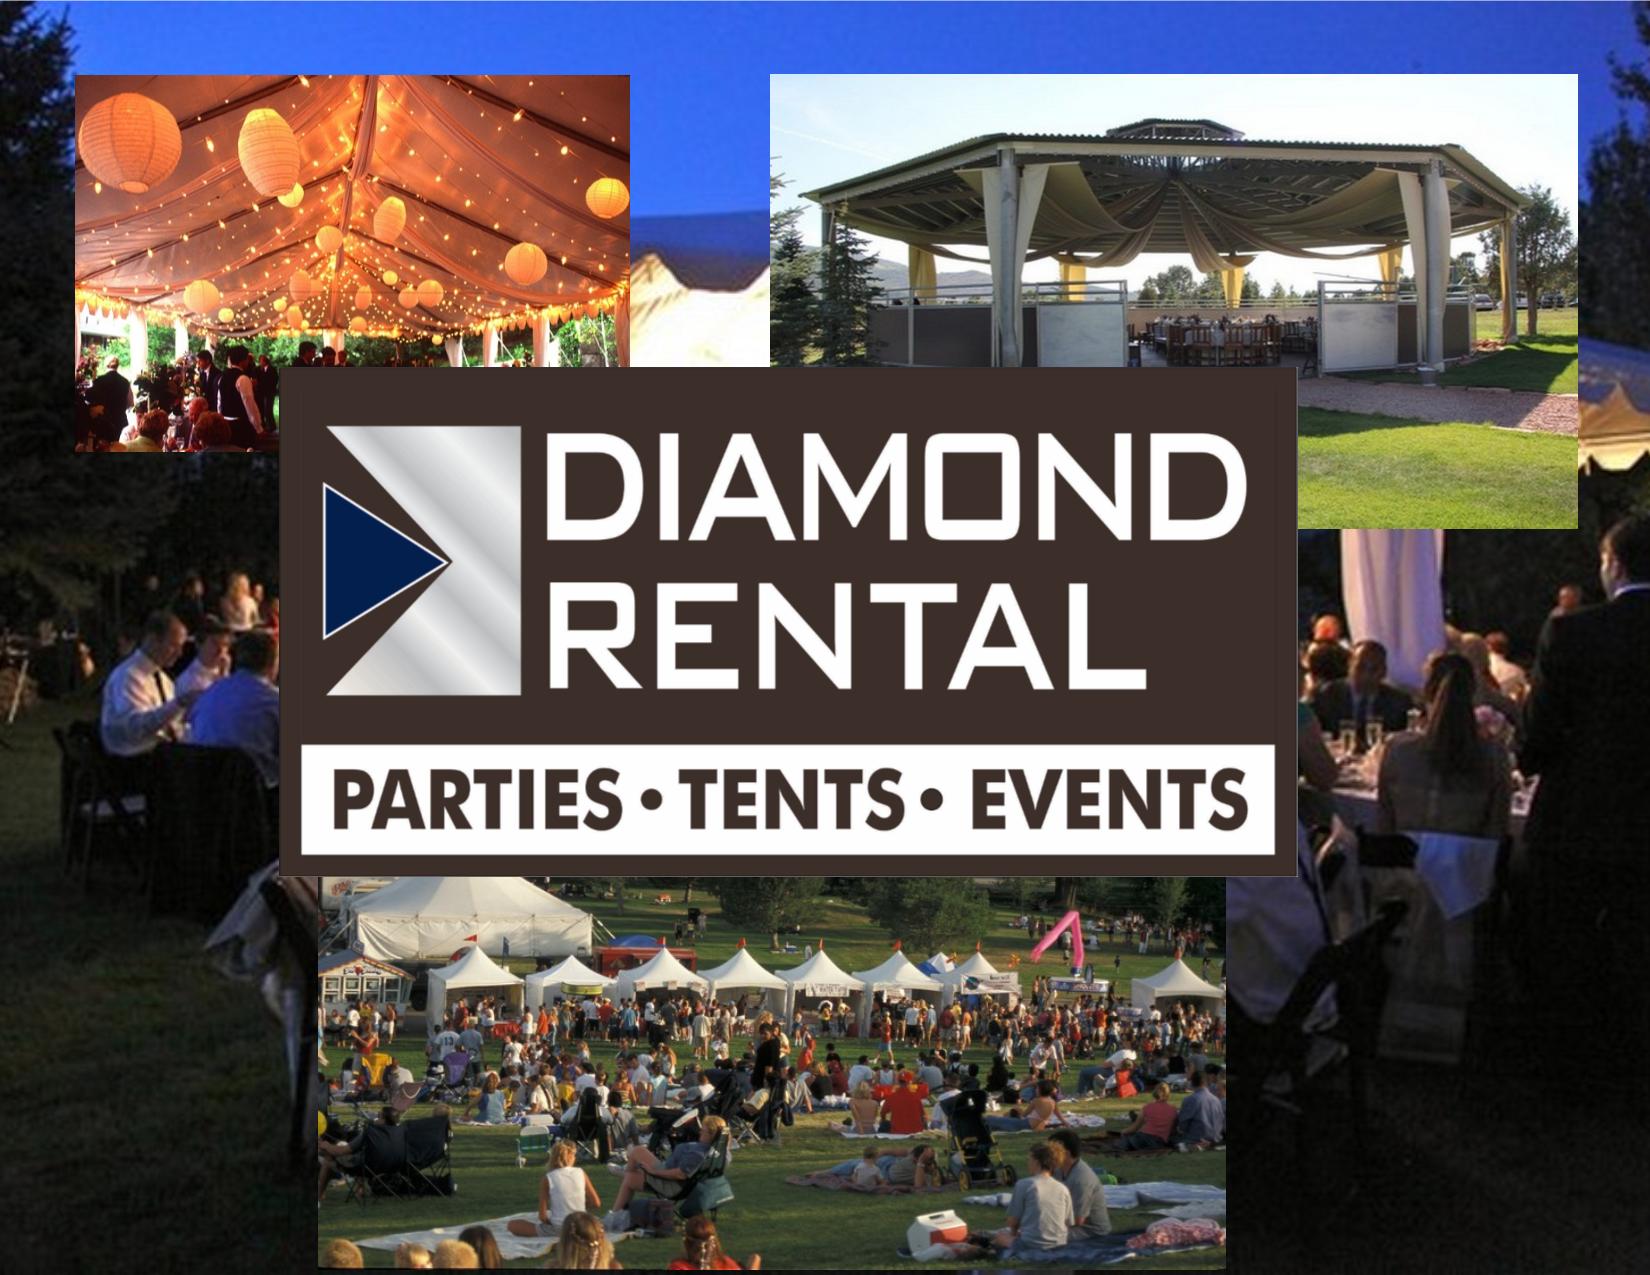 Diamond Rental collage.png